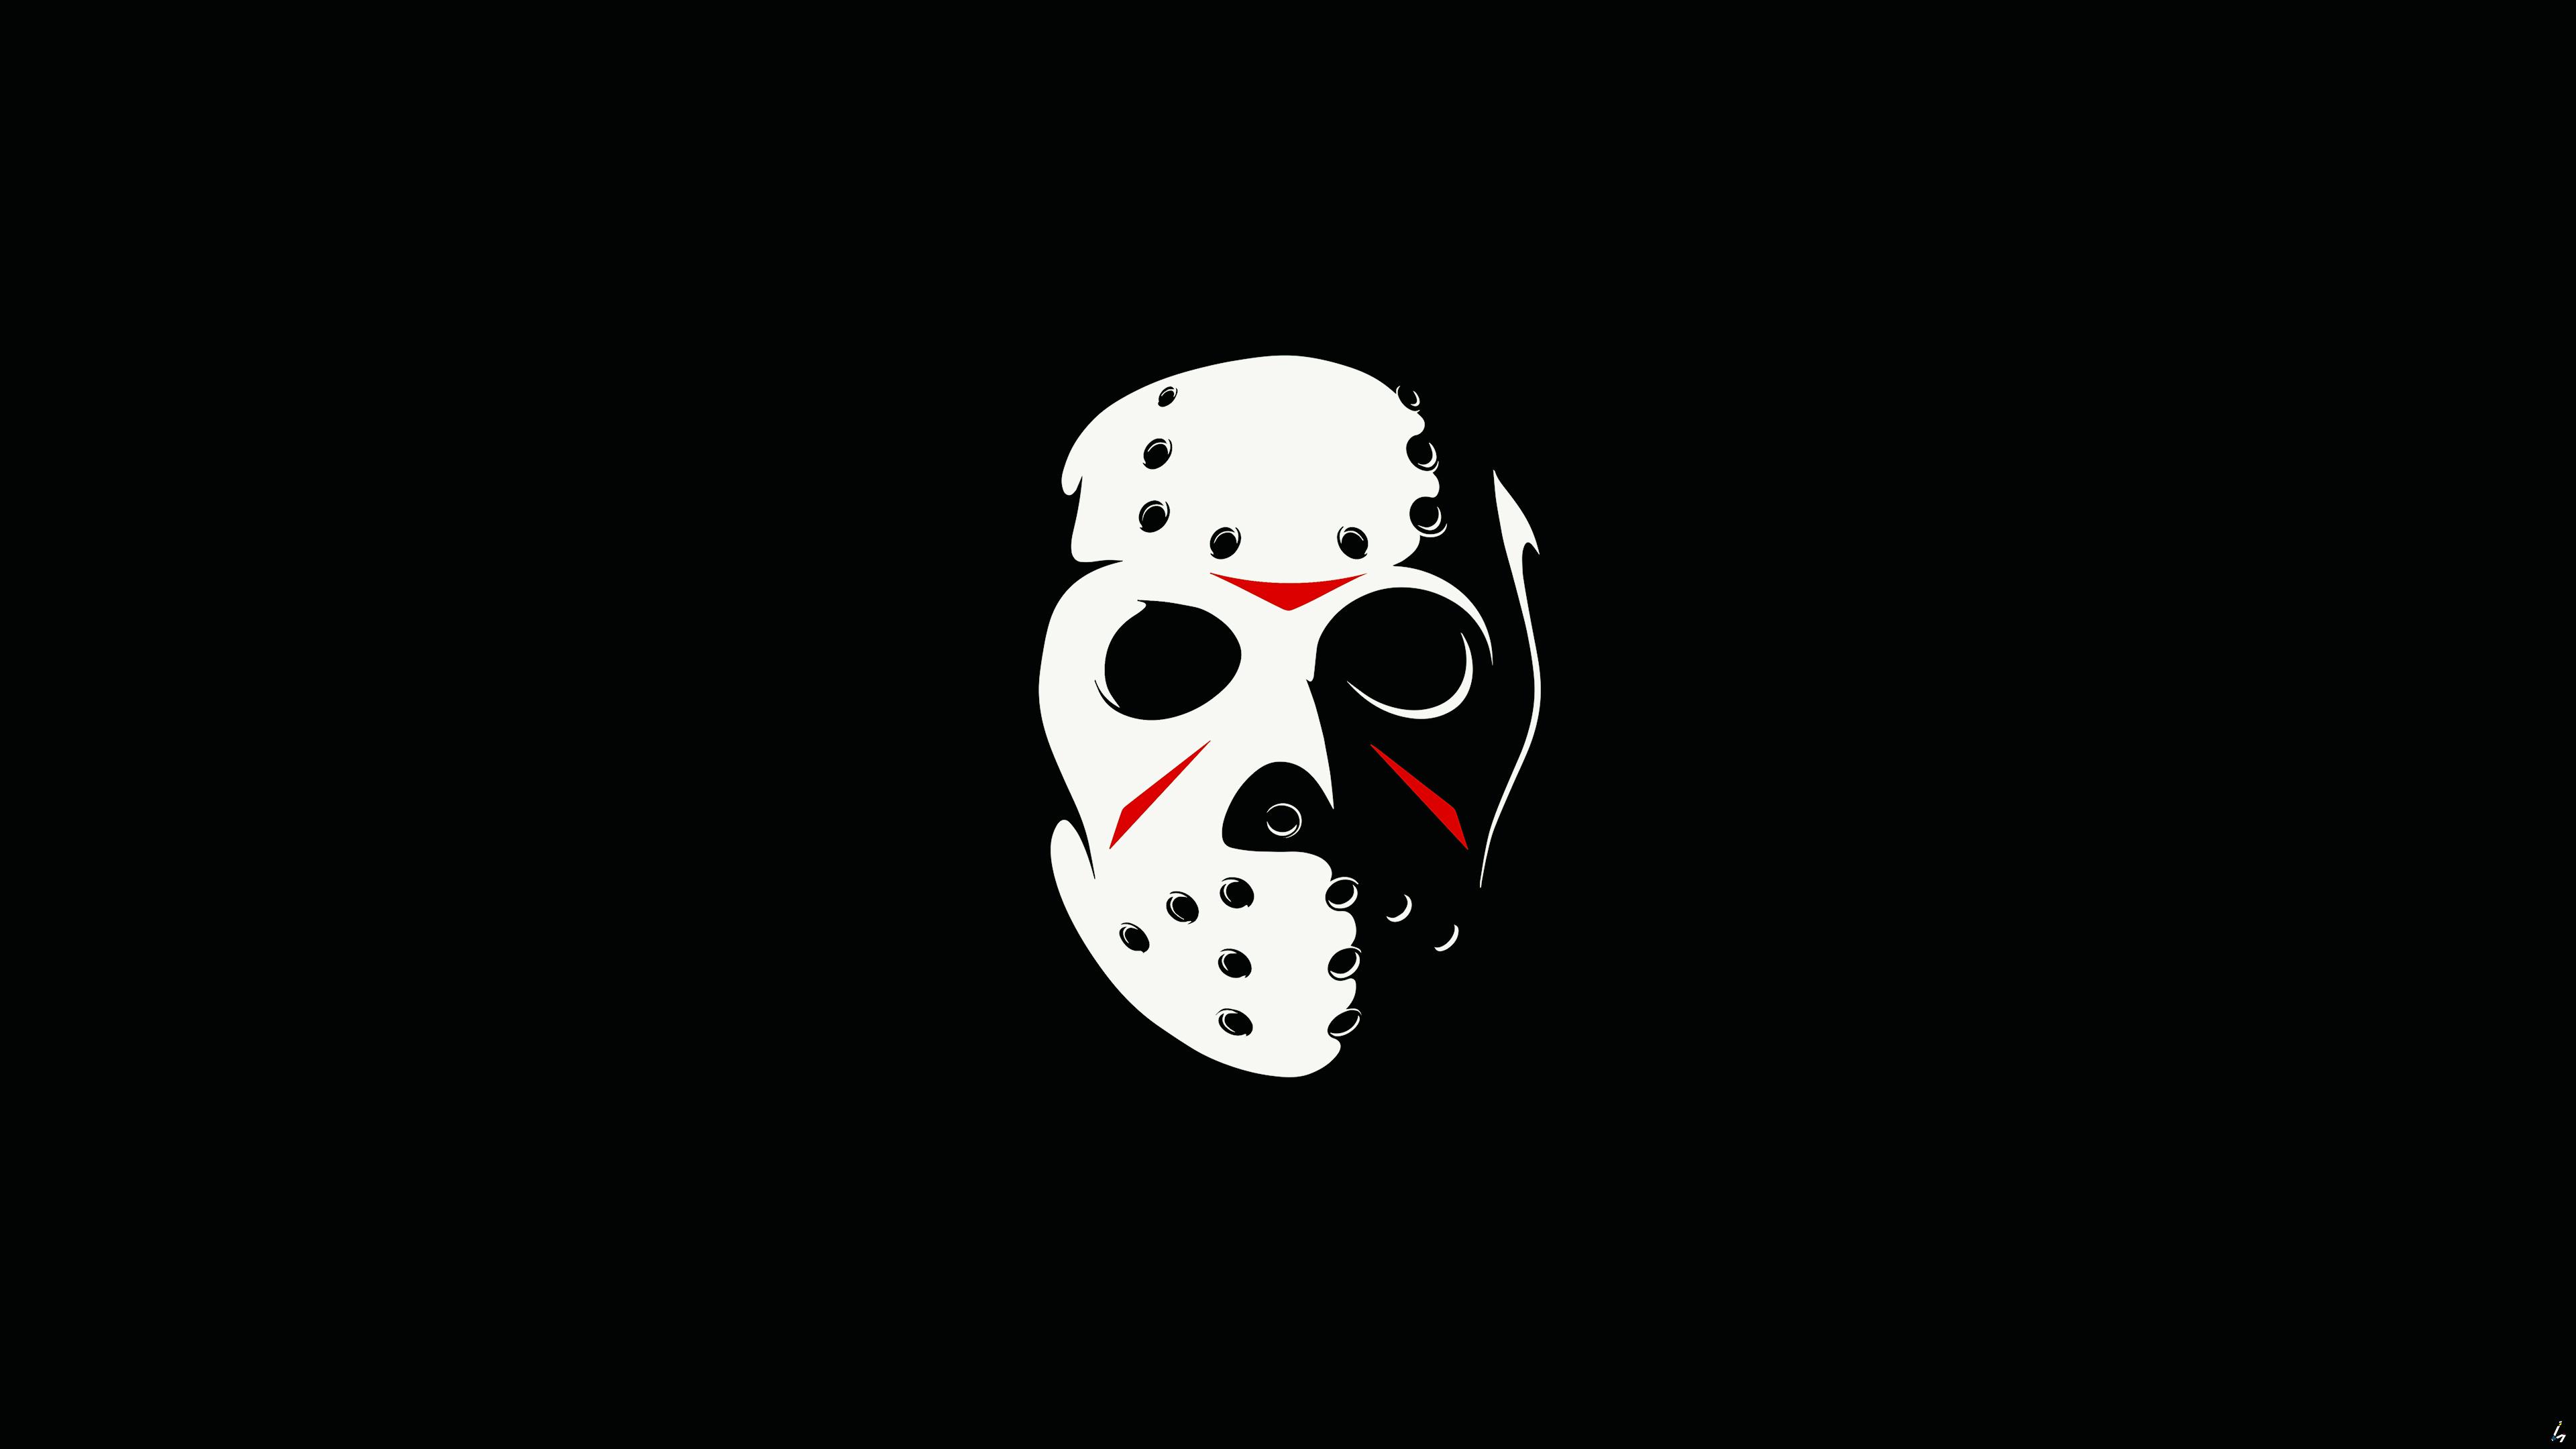 Wallpaper Minimalism Jason Voorhees Friday The 13th